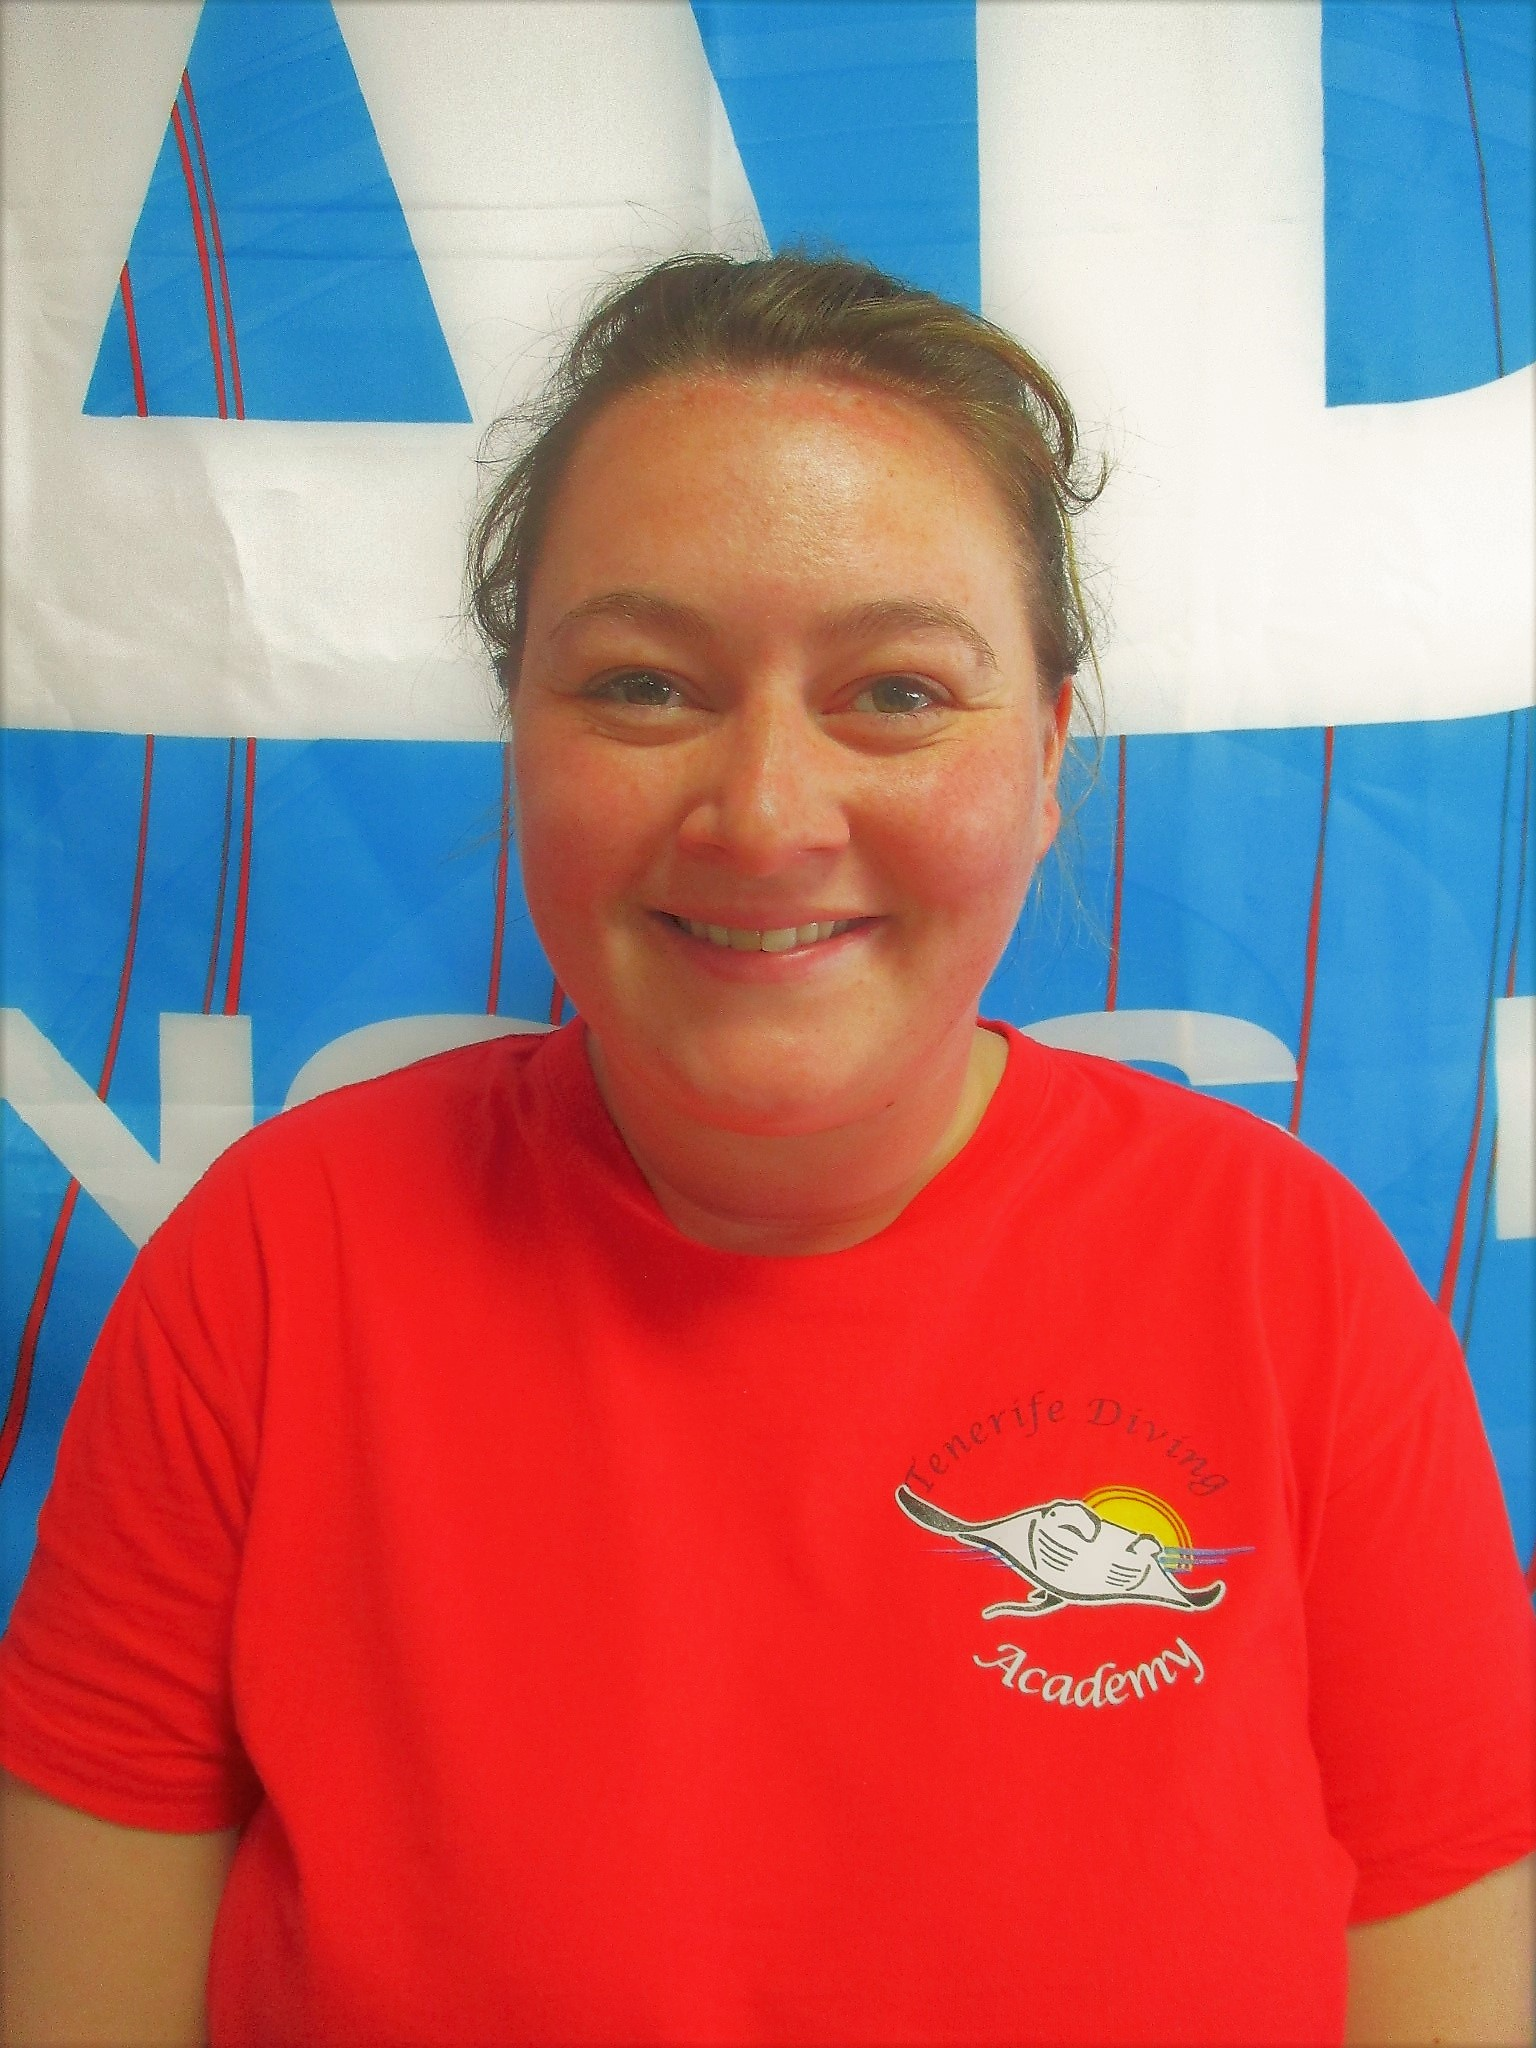 PADI Divemaster intern Charlene